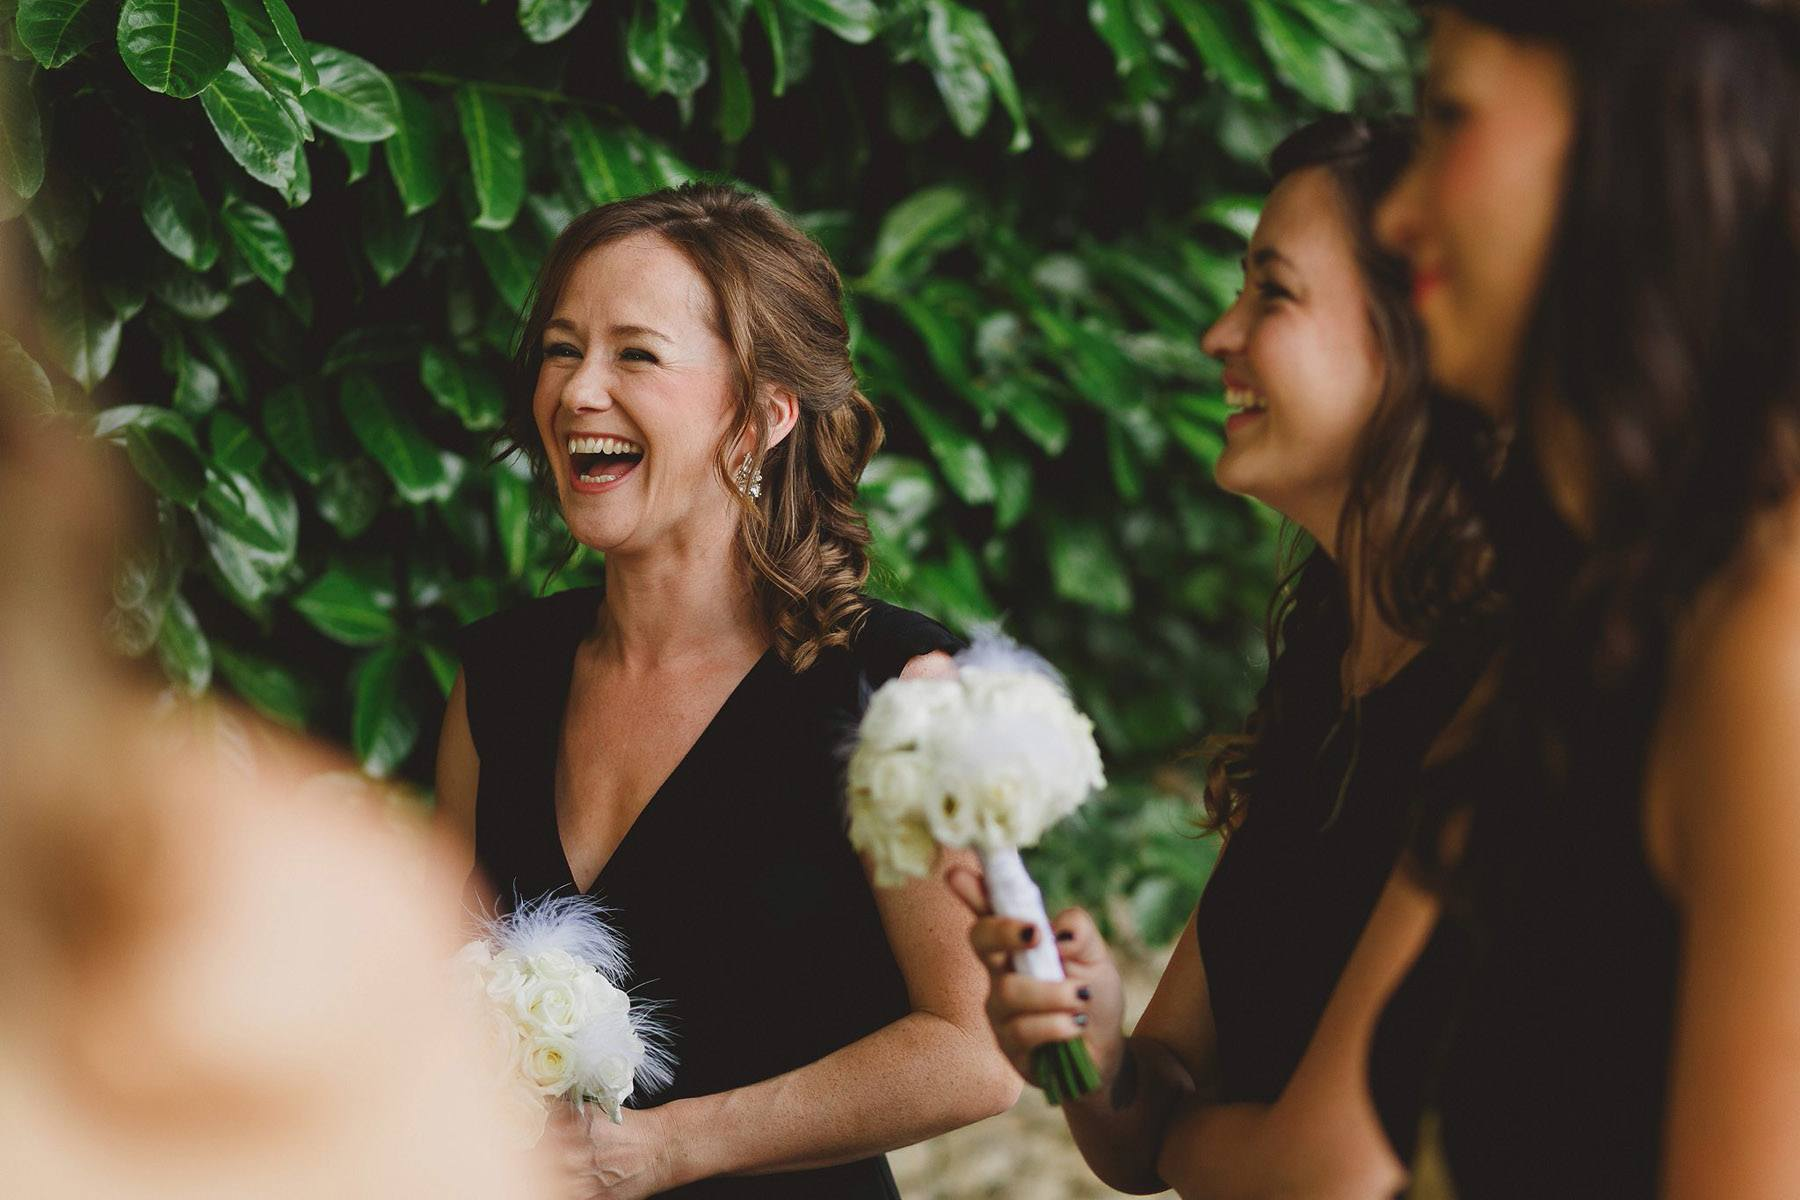 oxfordshire-wedding-photographer-024